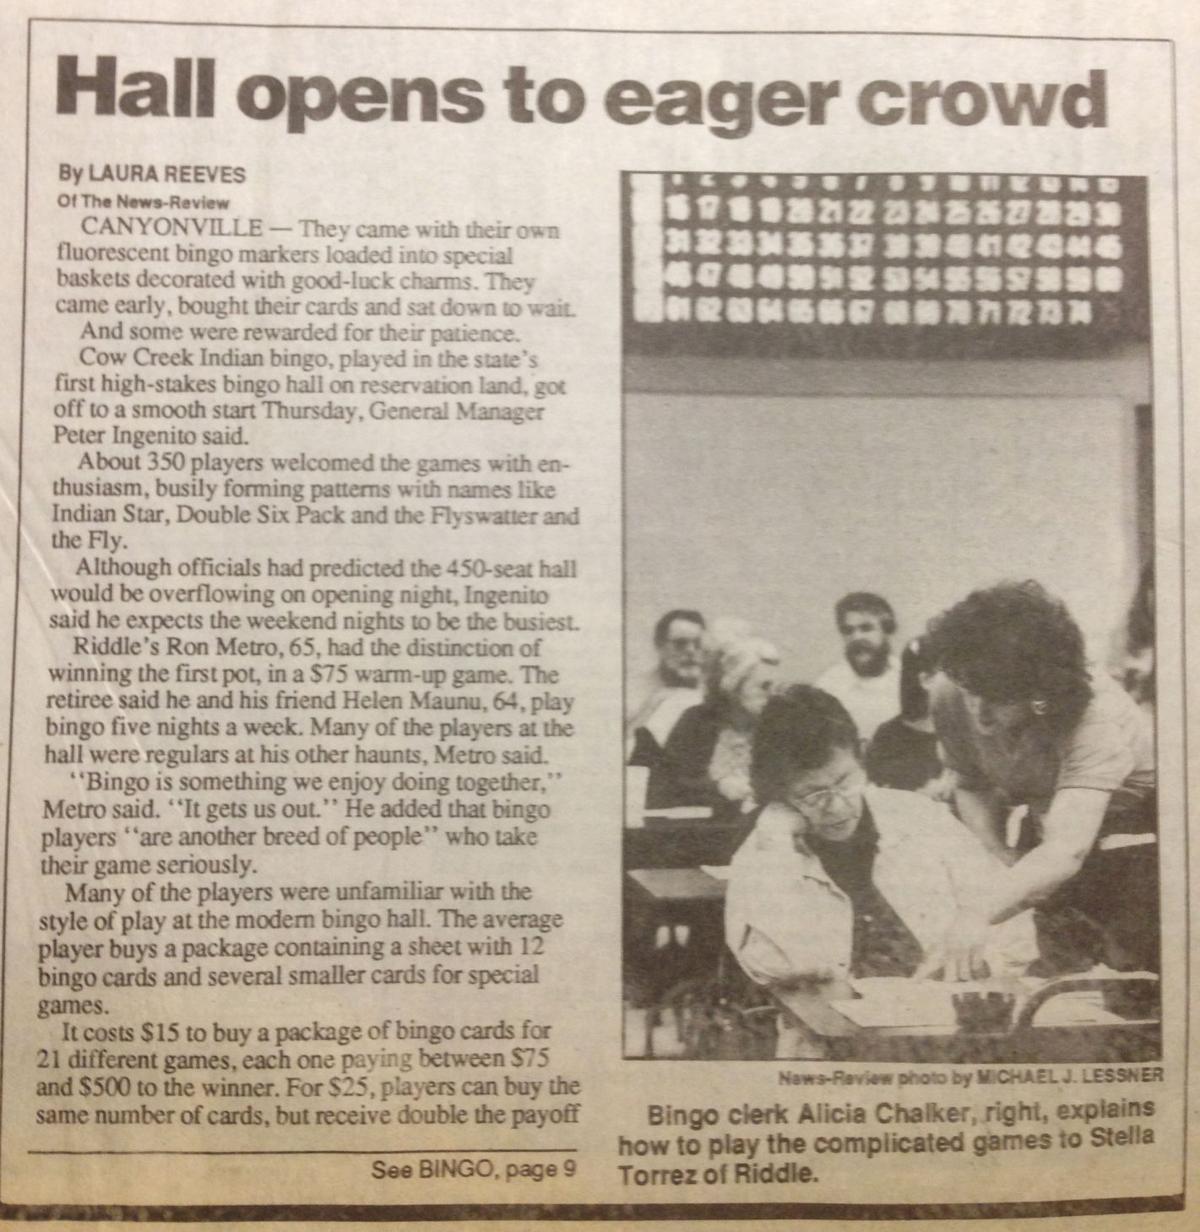 Canyonville Bingo Hall opening, pt. 1